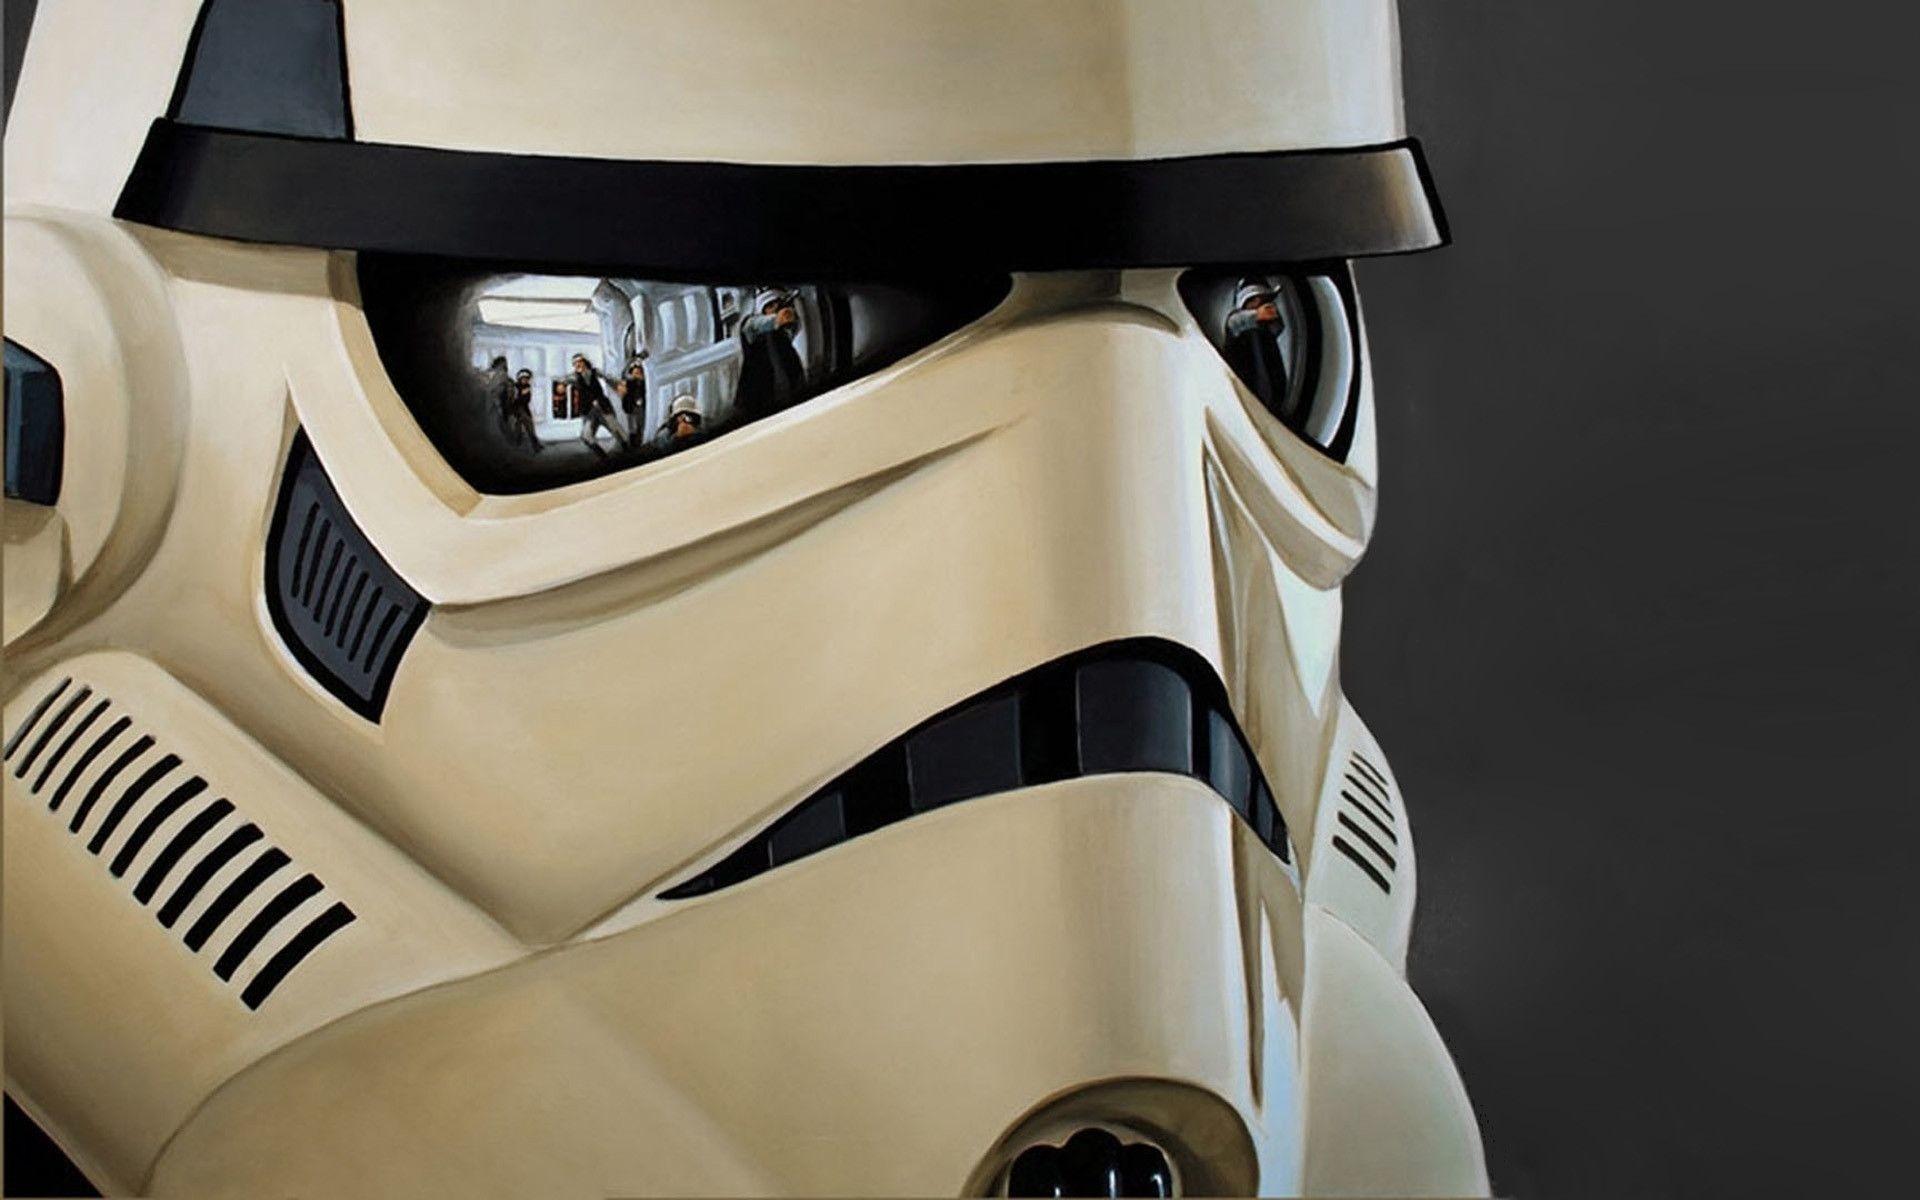 Star Wars Stormtrooper Wallpapers